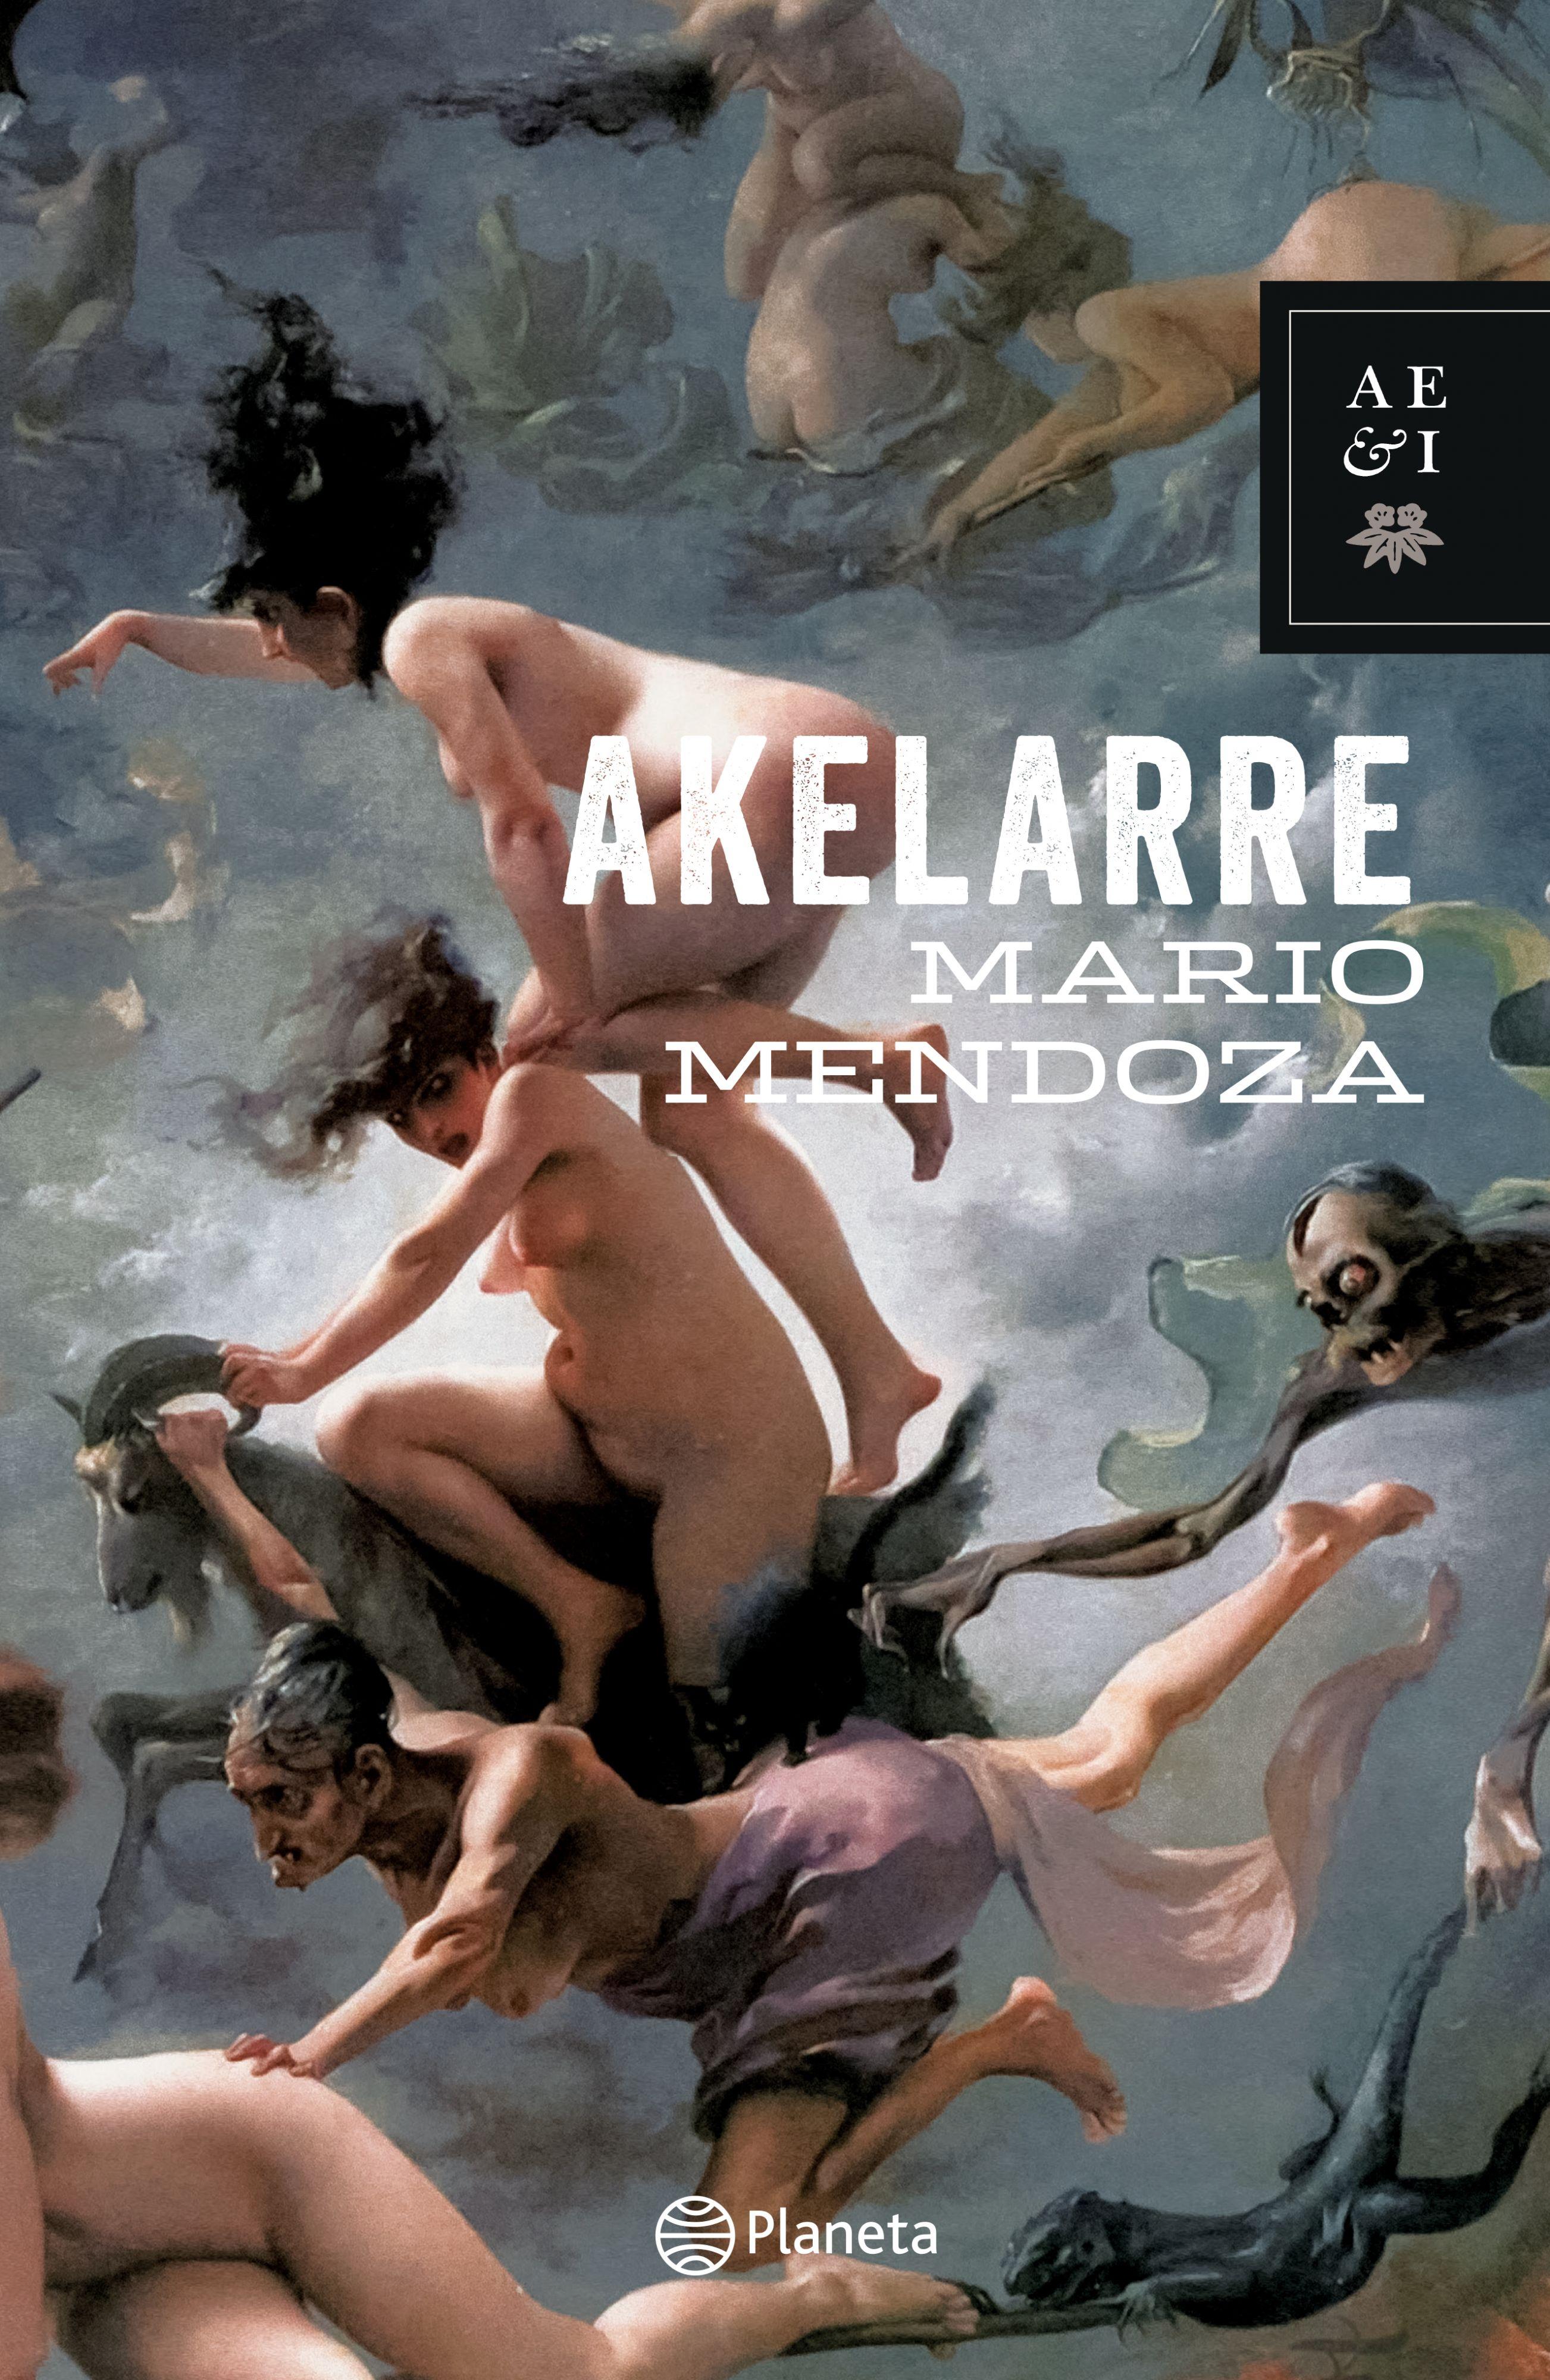 Akelarre - Mario Mendoza - Planeta